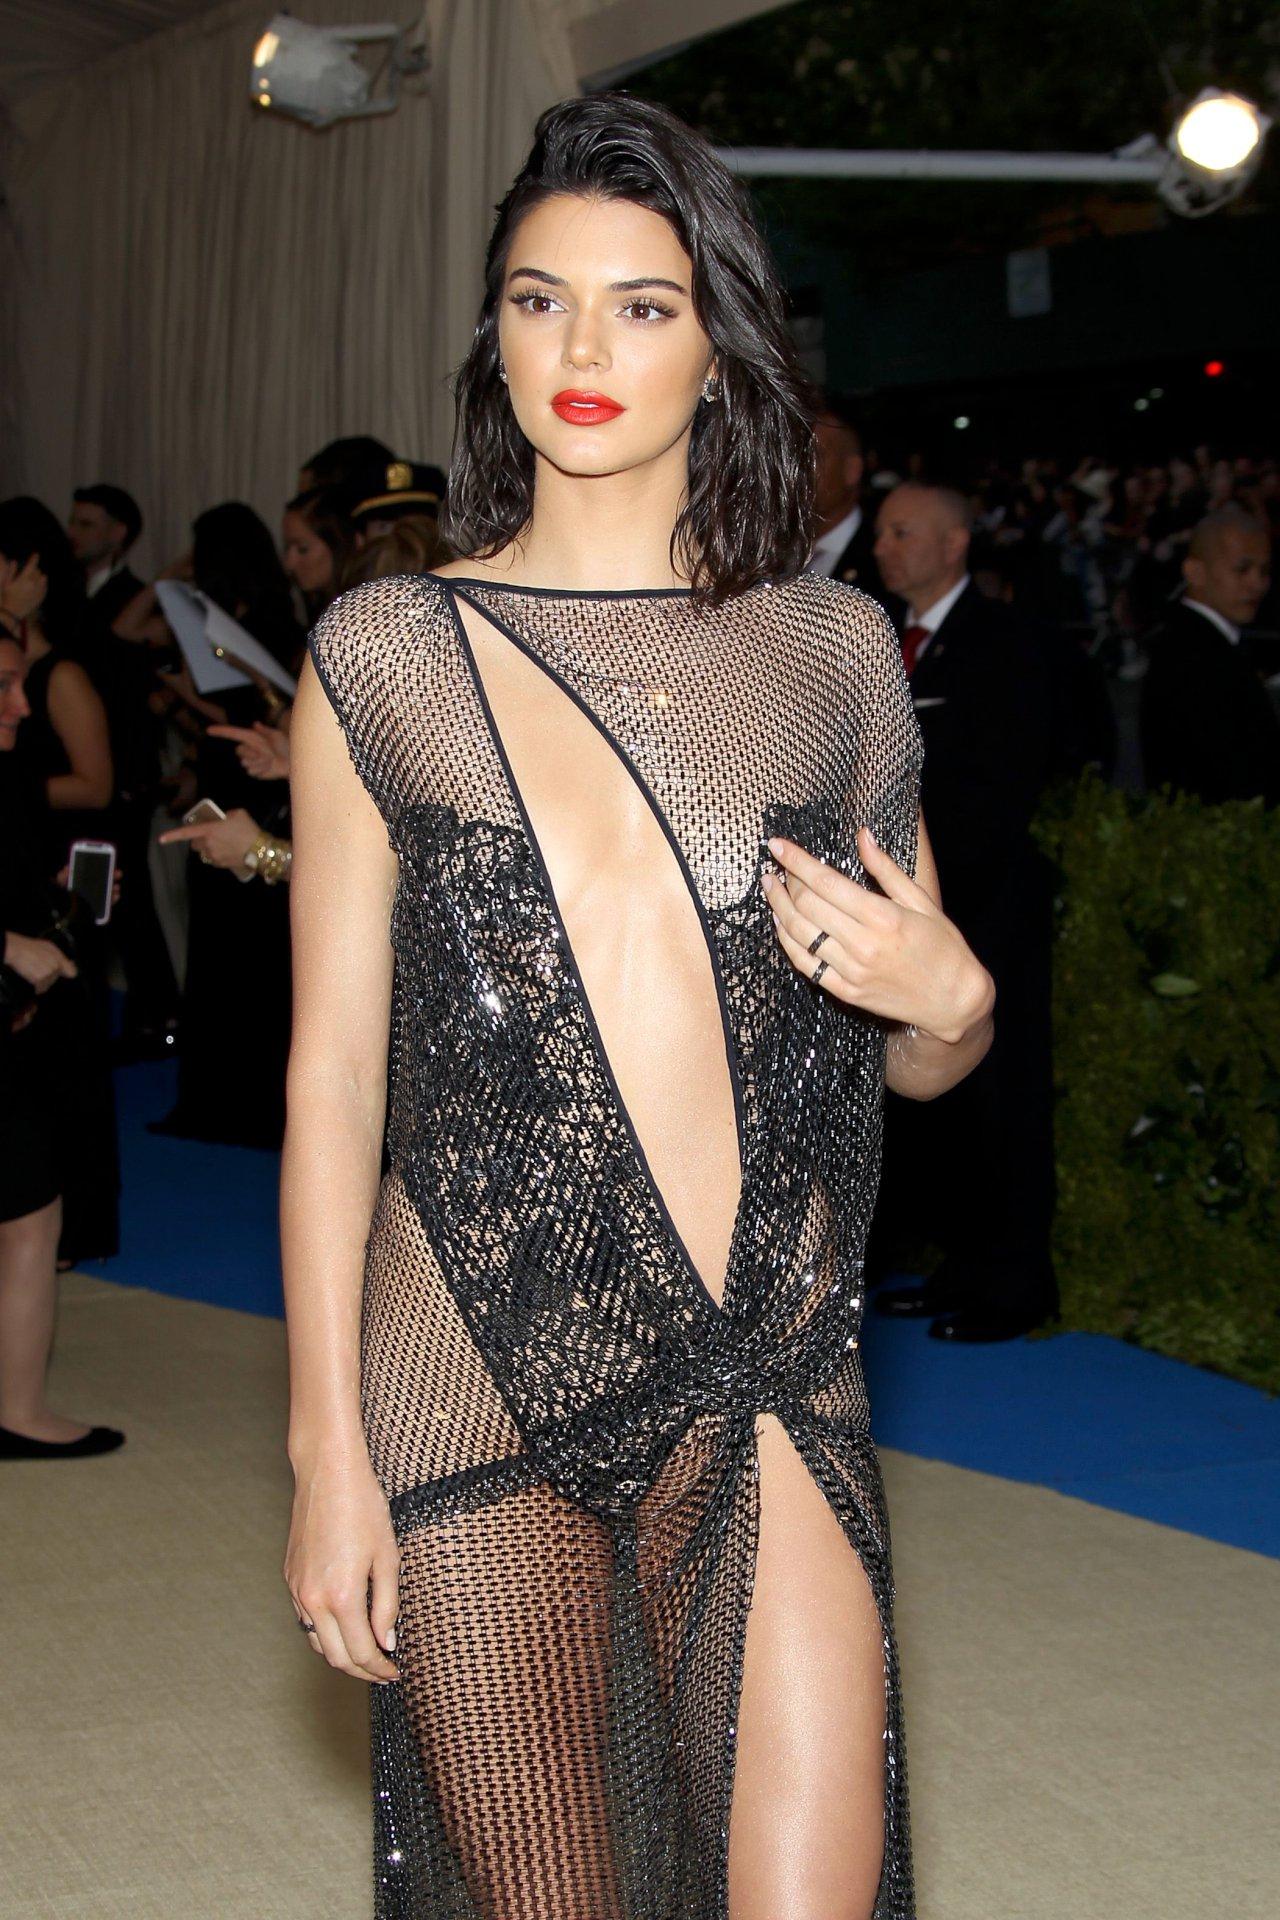 Kendall Jenner (38) | Hot Celebs Home Nicole Scherzinger Instagram